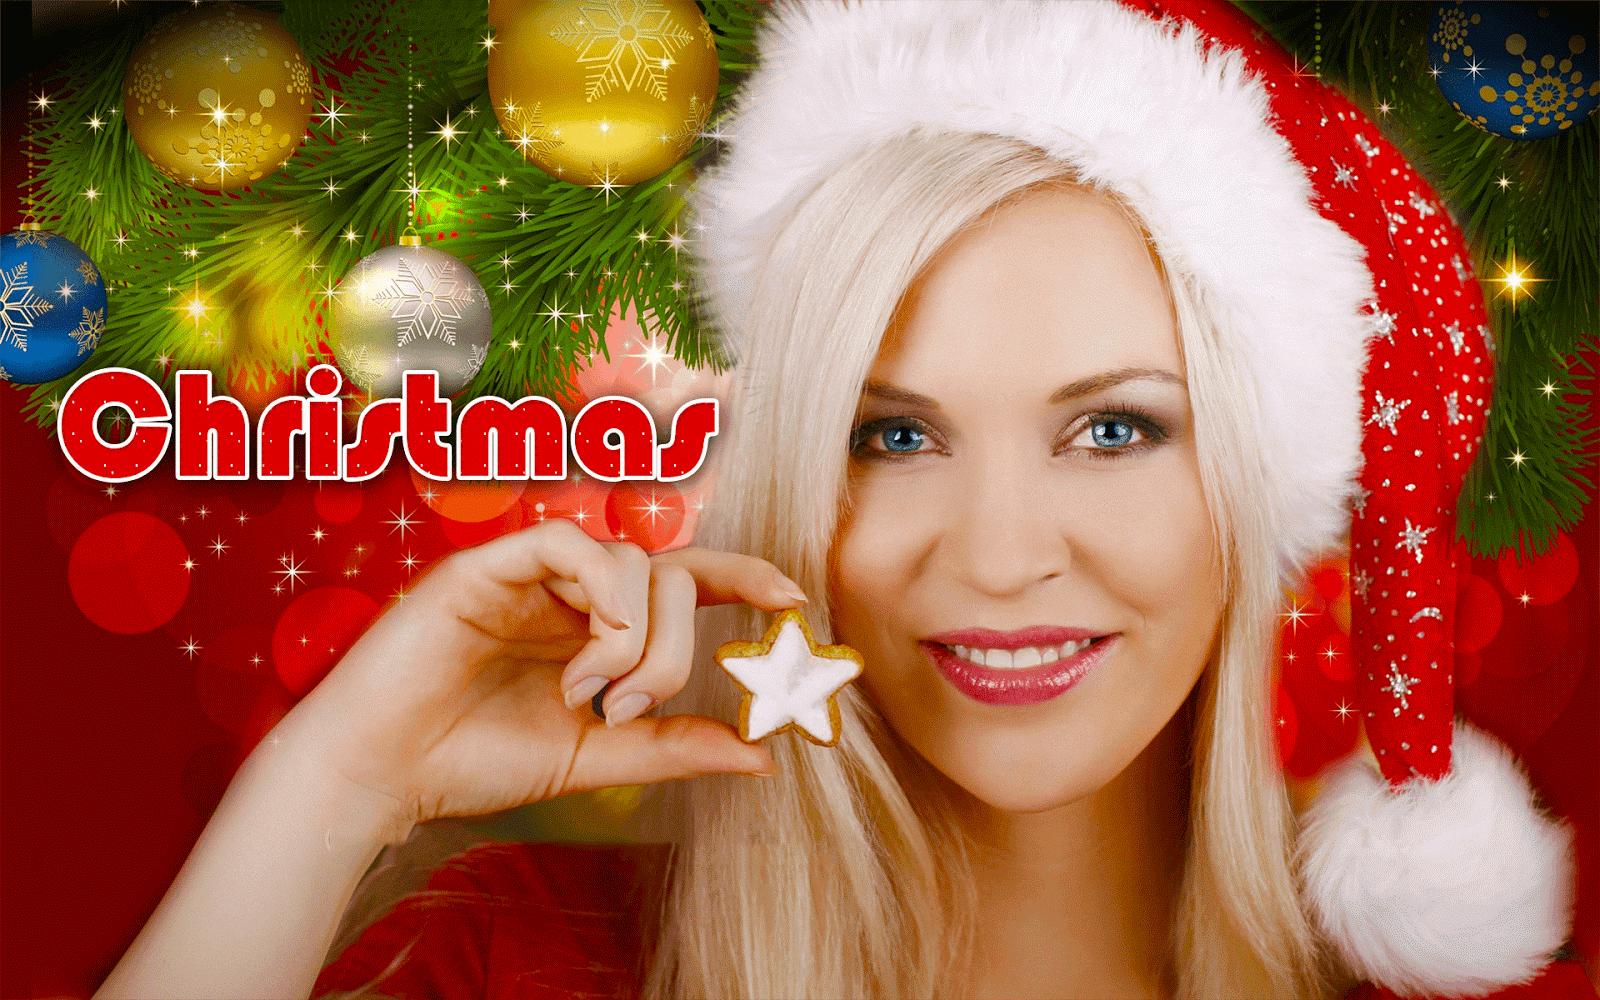 Golmaal Again Movie Hd Wallpapers Download Free 1080p: Christmas Day Wallpapers HD Download Free 1080p